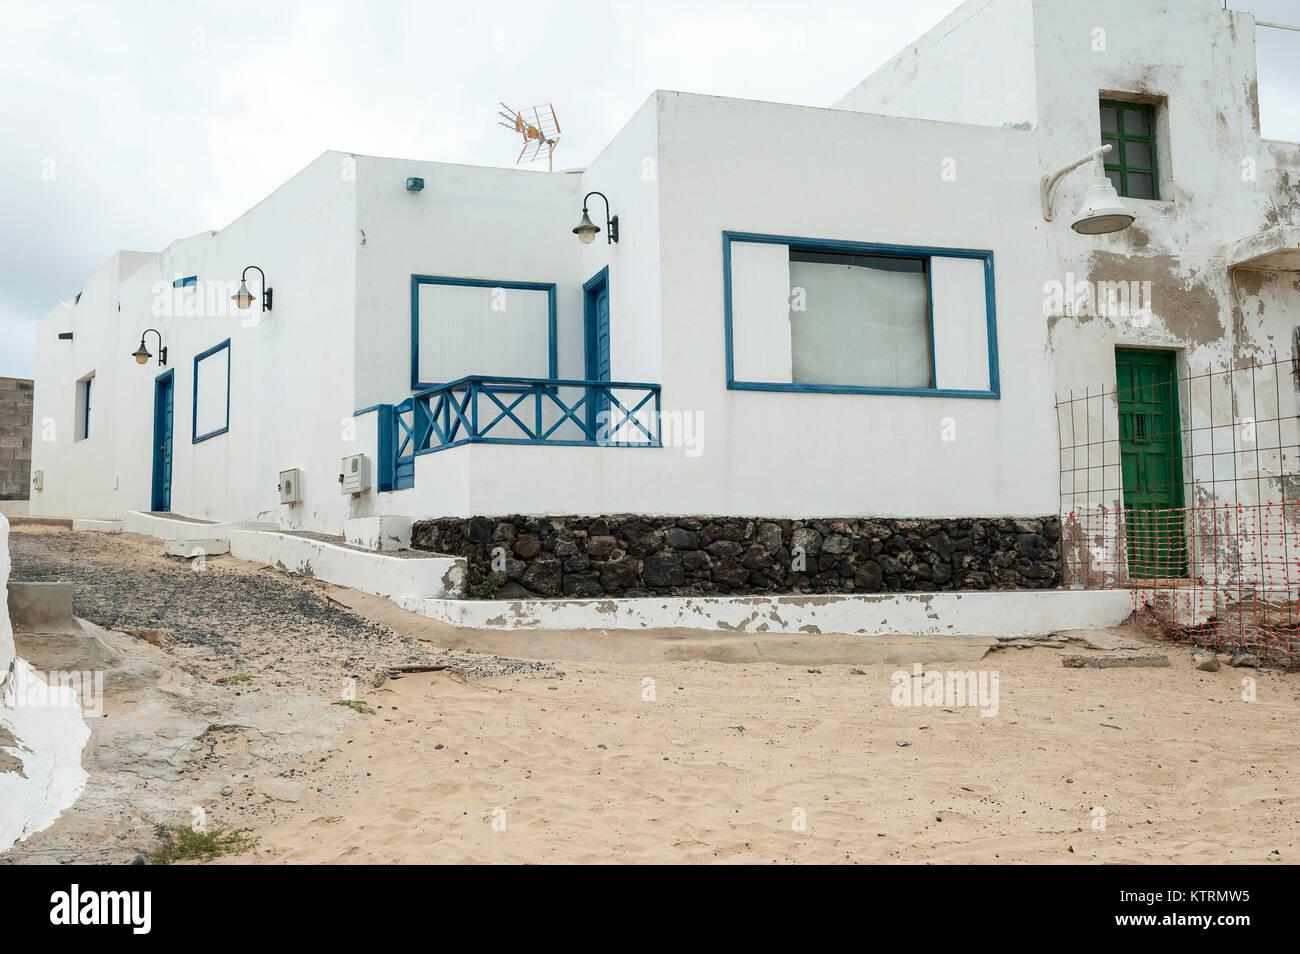 Straße in Caleta de Sebo, La Graciosa, Chinijo Archipel, Kanarische Inseln, Spanien Stockbild